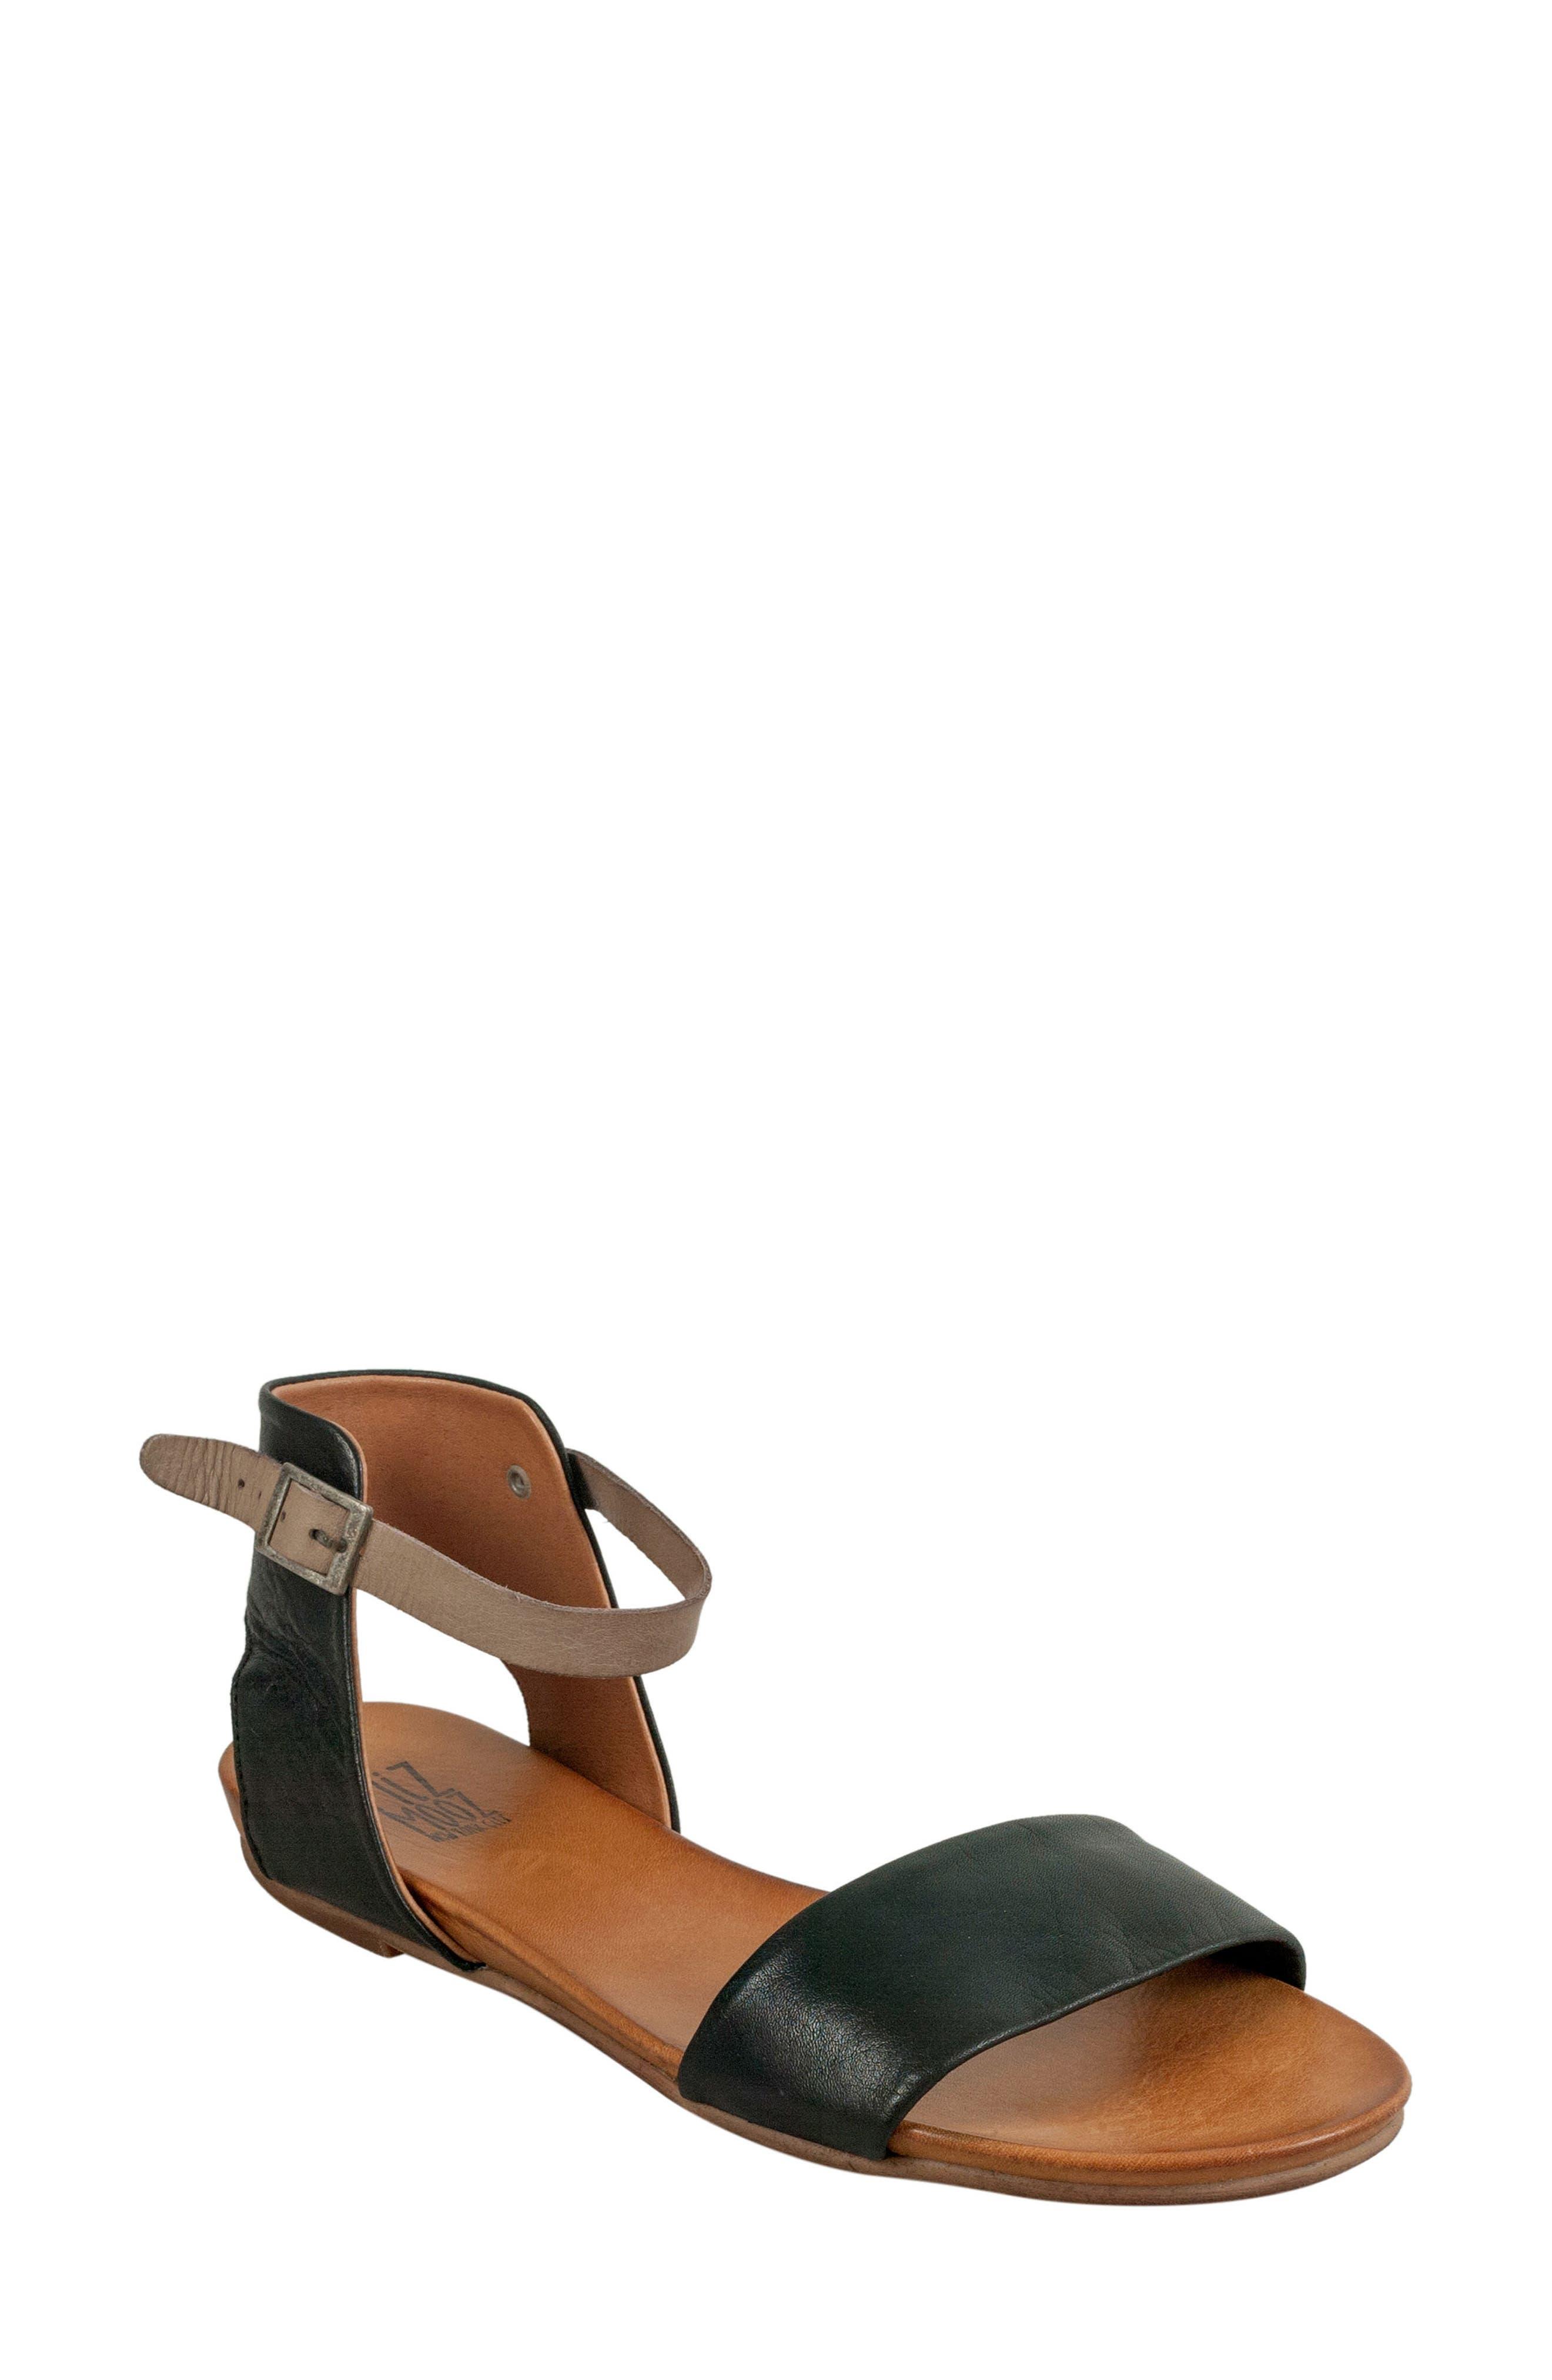 'Alanis' Sandal,                         Main,                         color, Black Leather